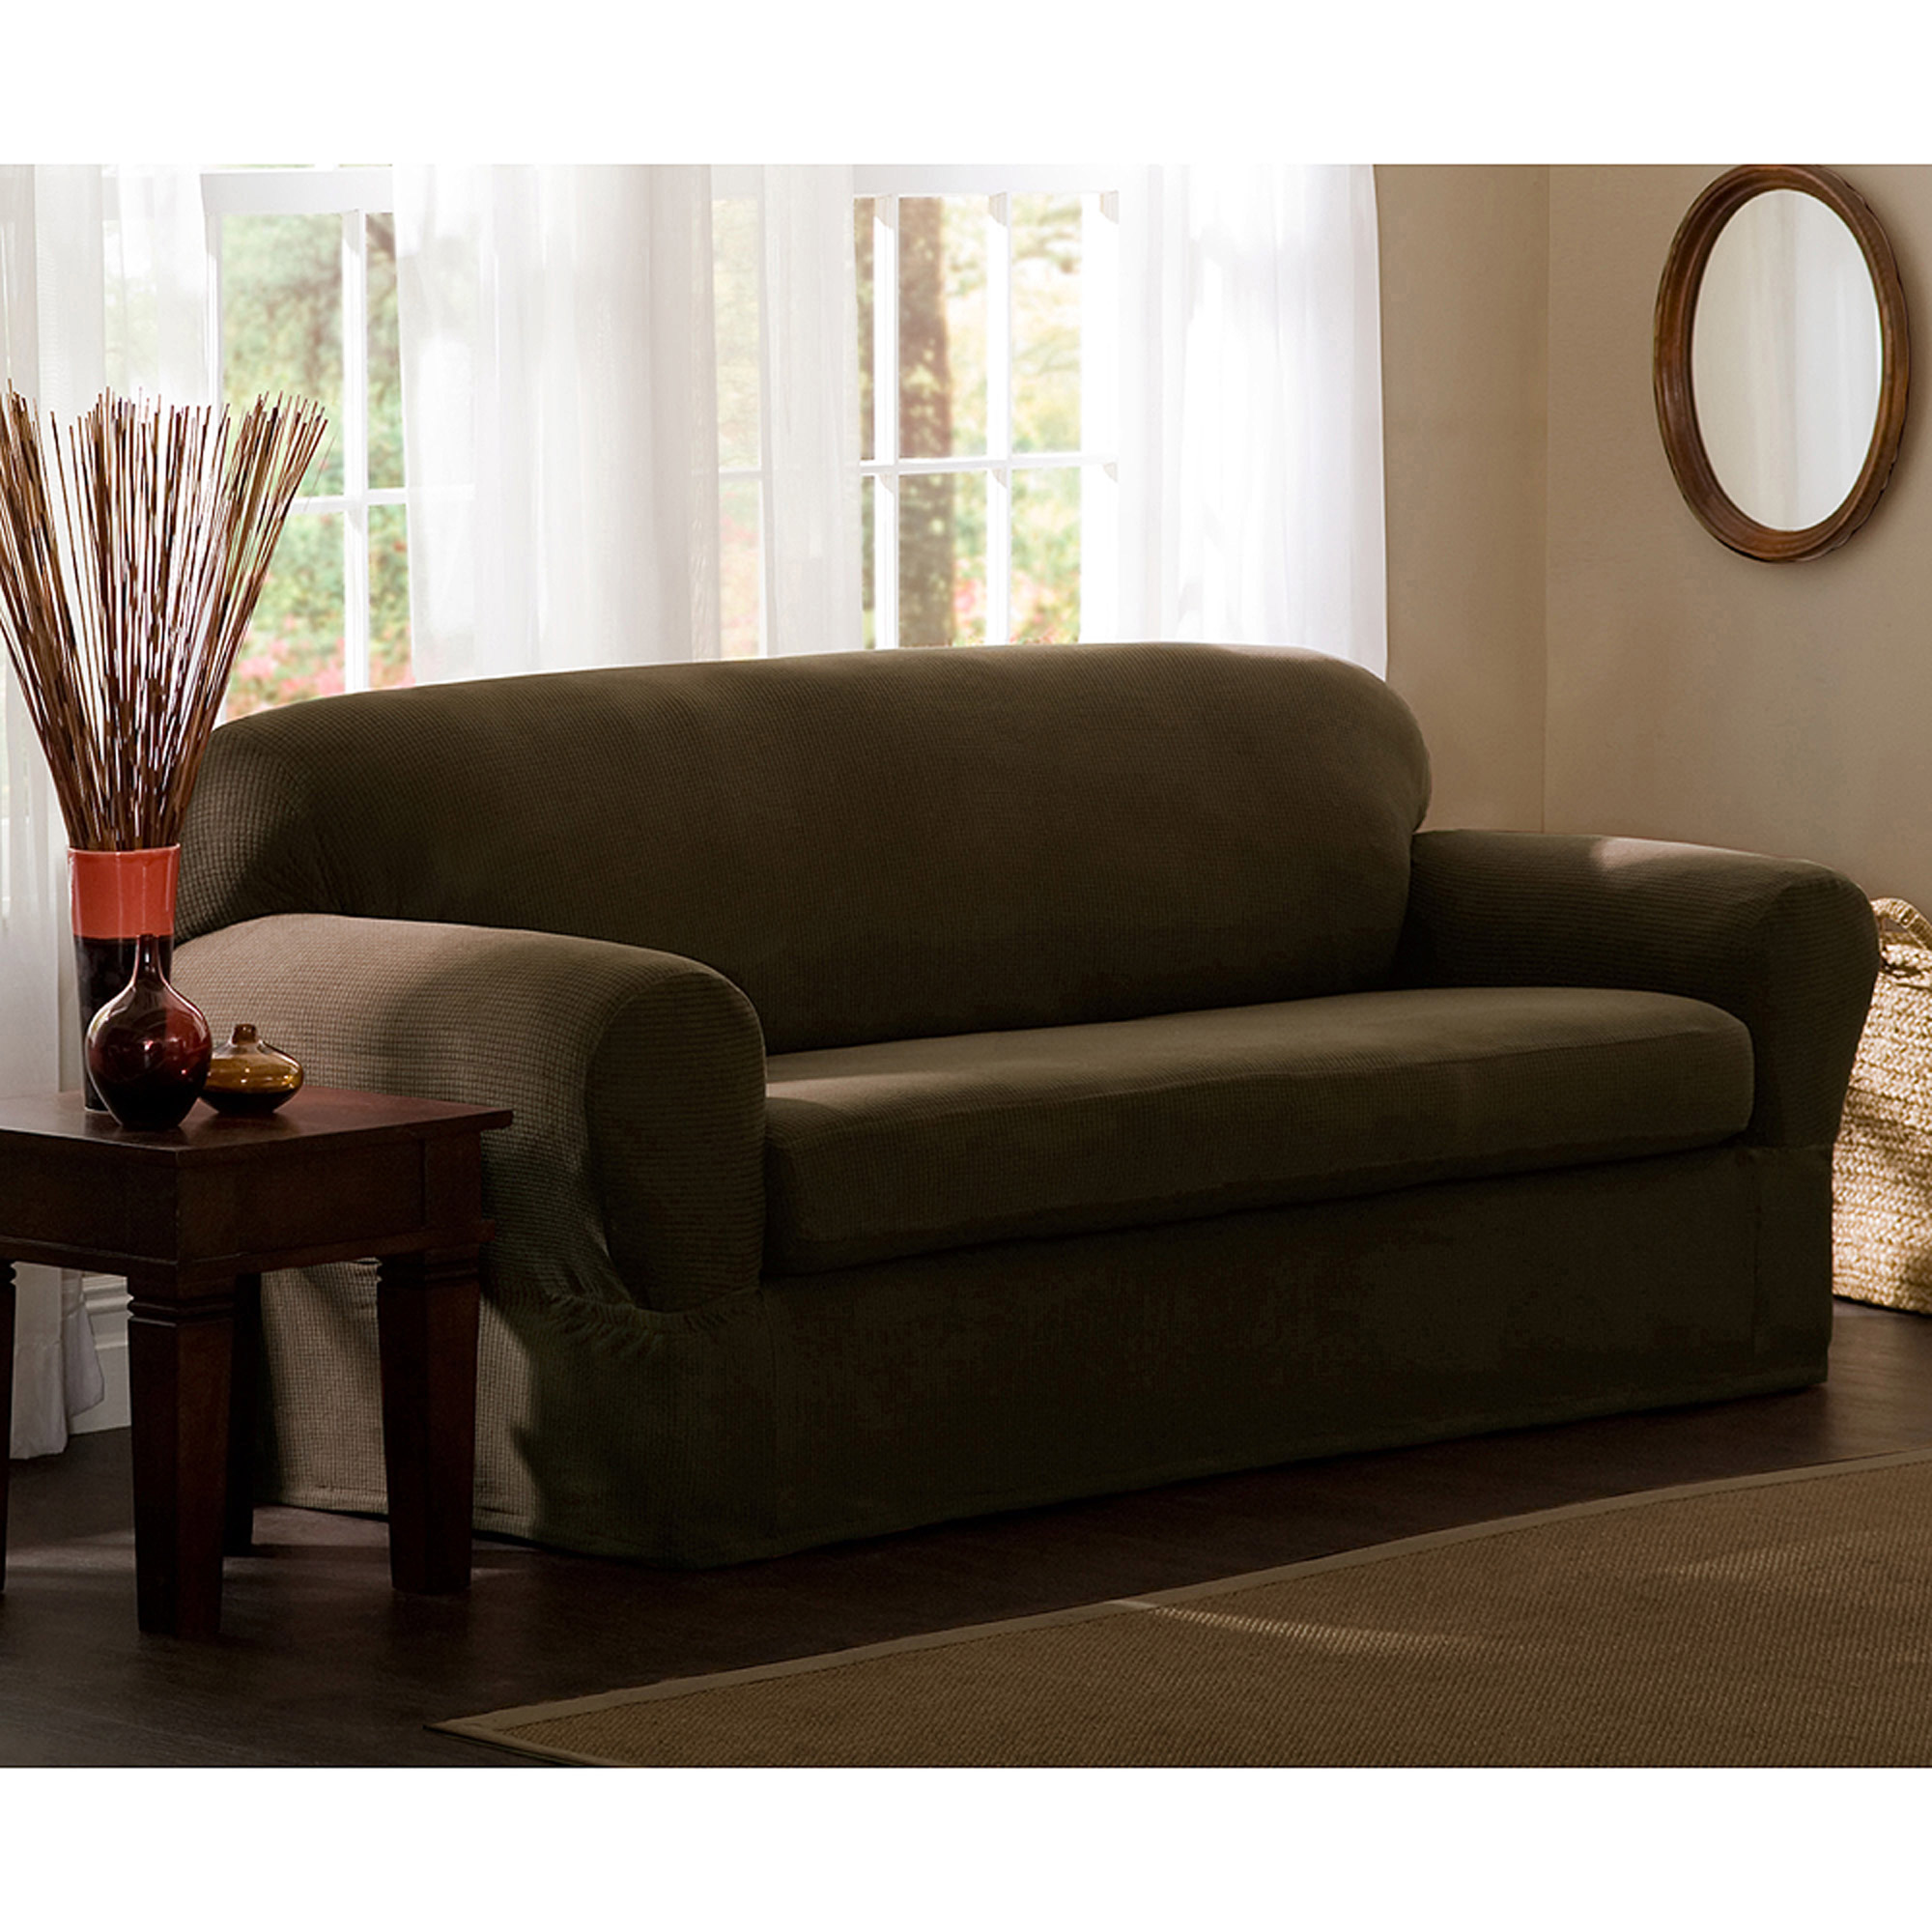 Maytex Reeves Polyester/Spandex Sofa Slipcover